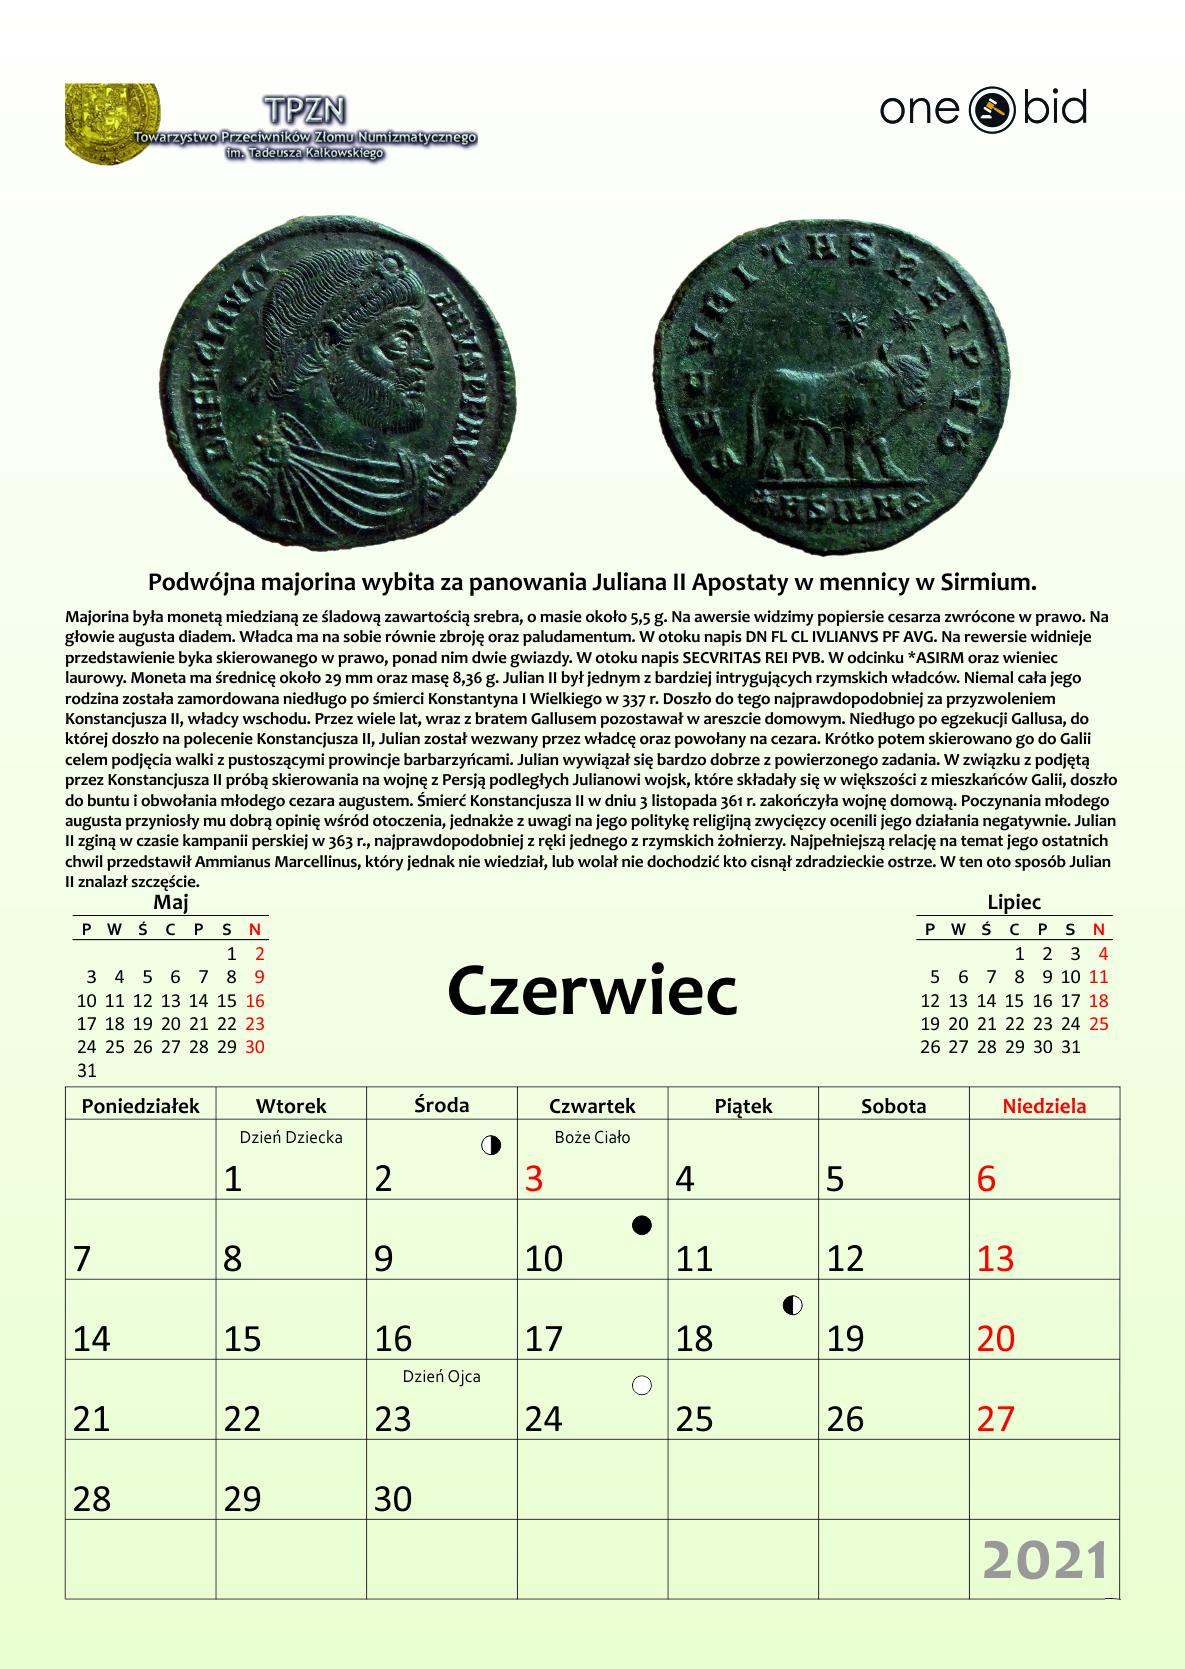 http://info.tpzn.pl/kalendarze/kalendarz2021/czerwiec2021.jpg